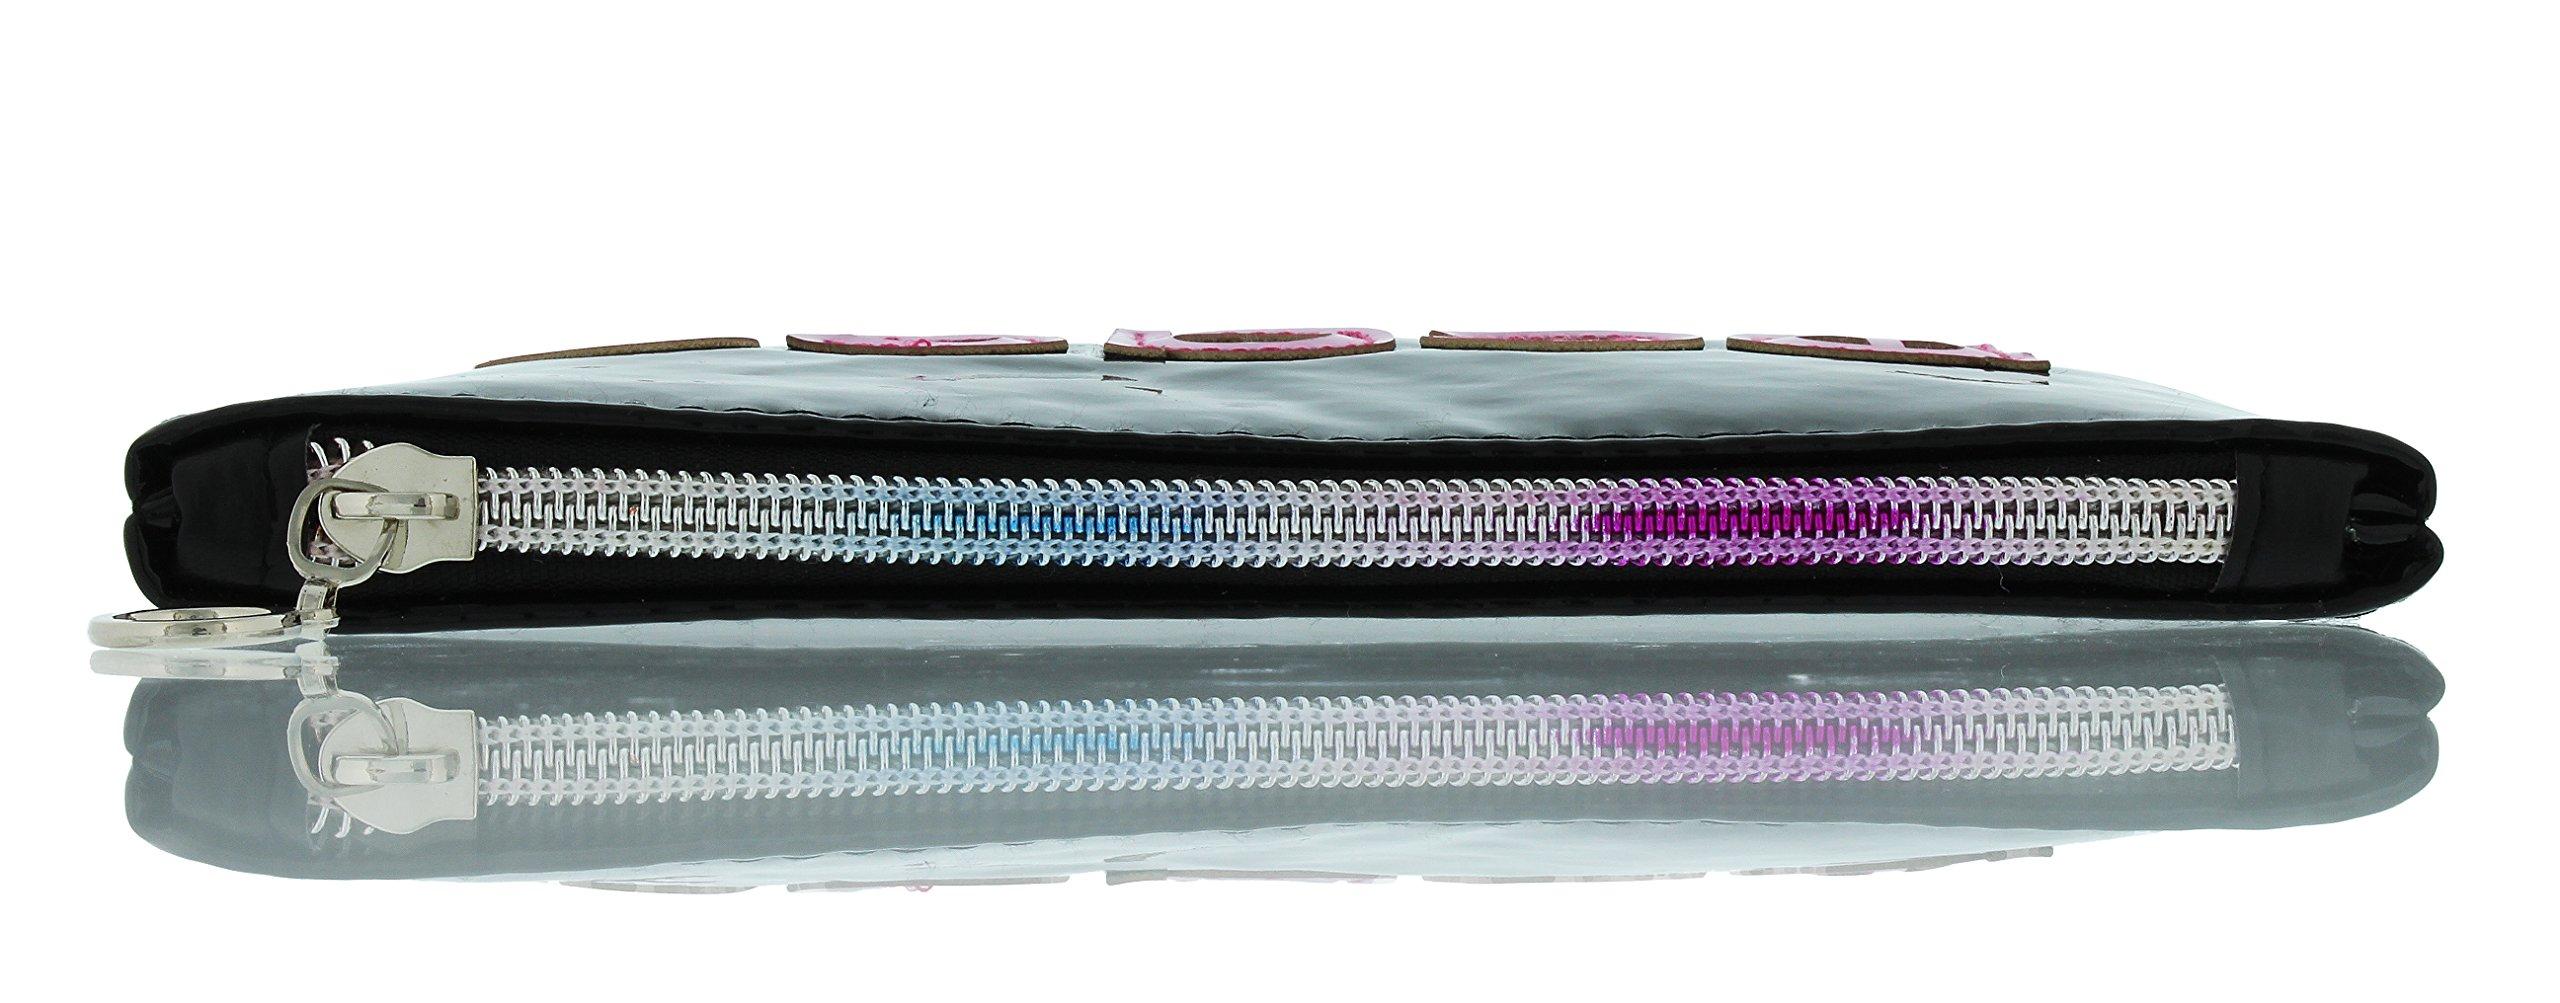 Evolution Eyes Whims Shiny Vinyl Padded Multipurpose Zipper Case Pouch, Peace by Evolution Eyes (Image #4)